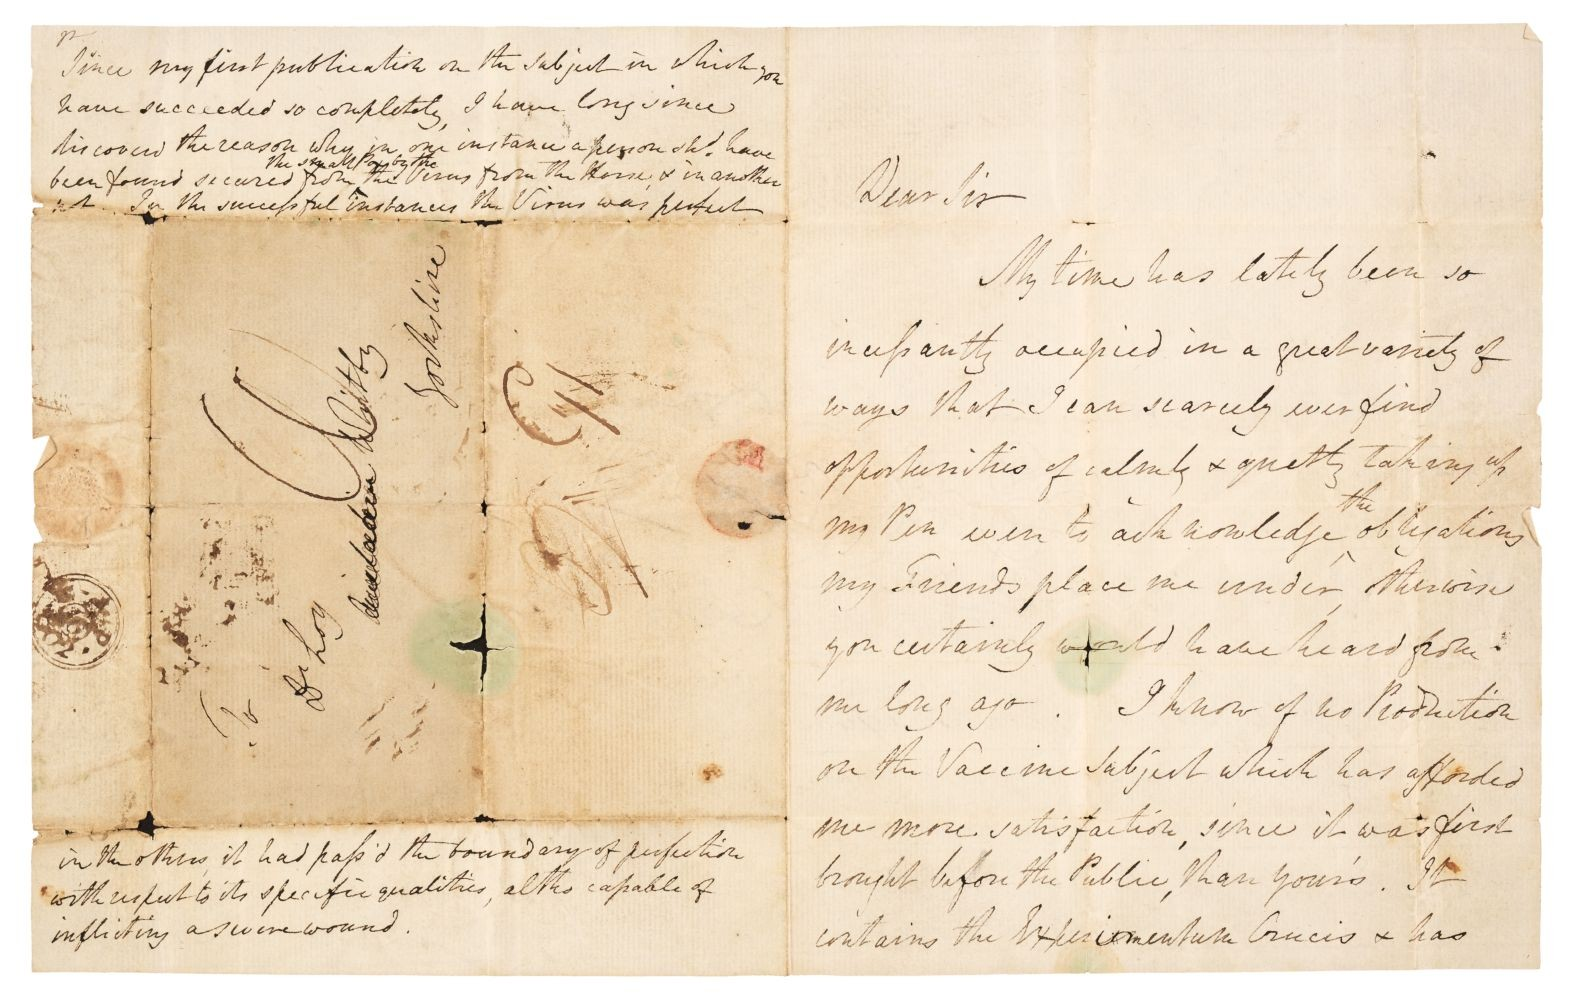 A carta de Edward Jenner era endereçada ao também médico John Glover Loy (Foto: Printed Books, Maps & Decorative Prints, Autographs, Documents, The Donald & Monique King Collection)